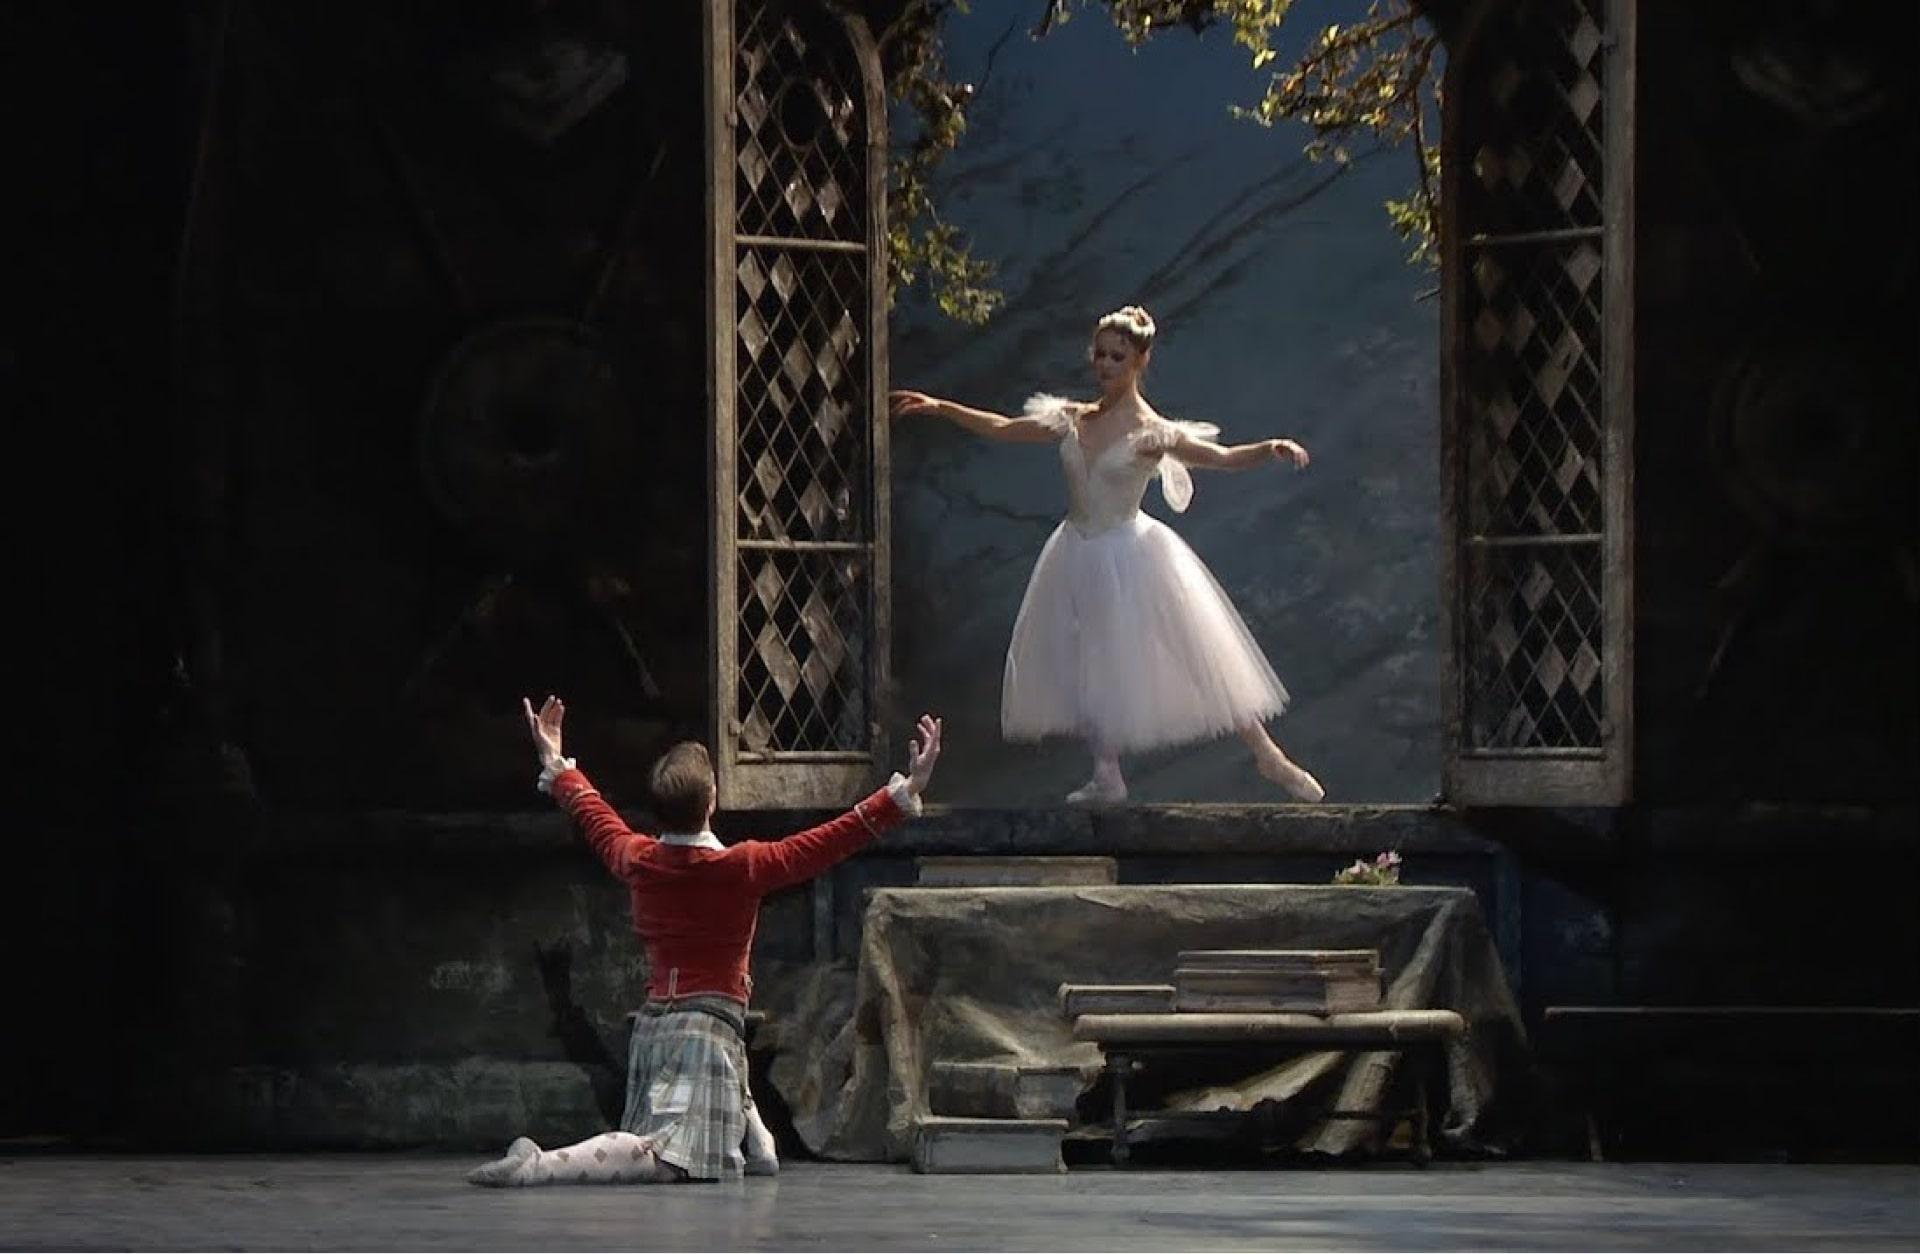 Dancer in kilt and red jacket knees before ballerina in white dress poised in open window.